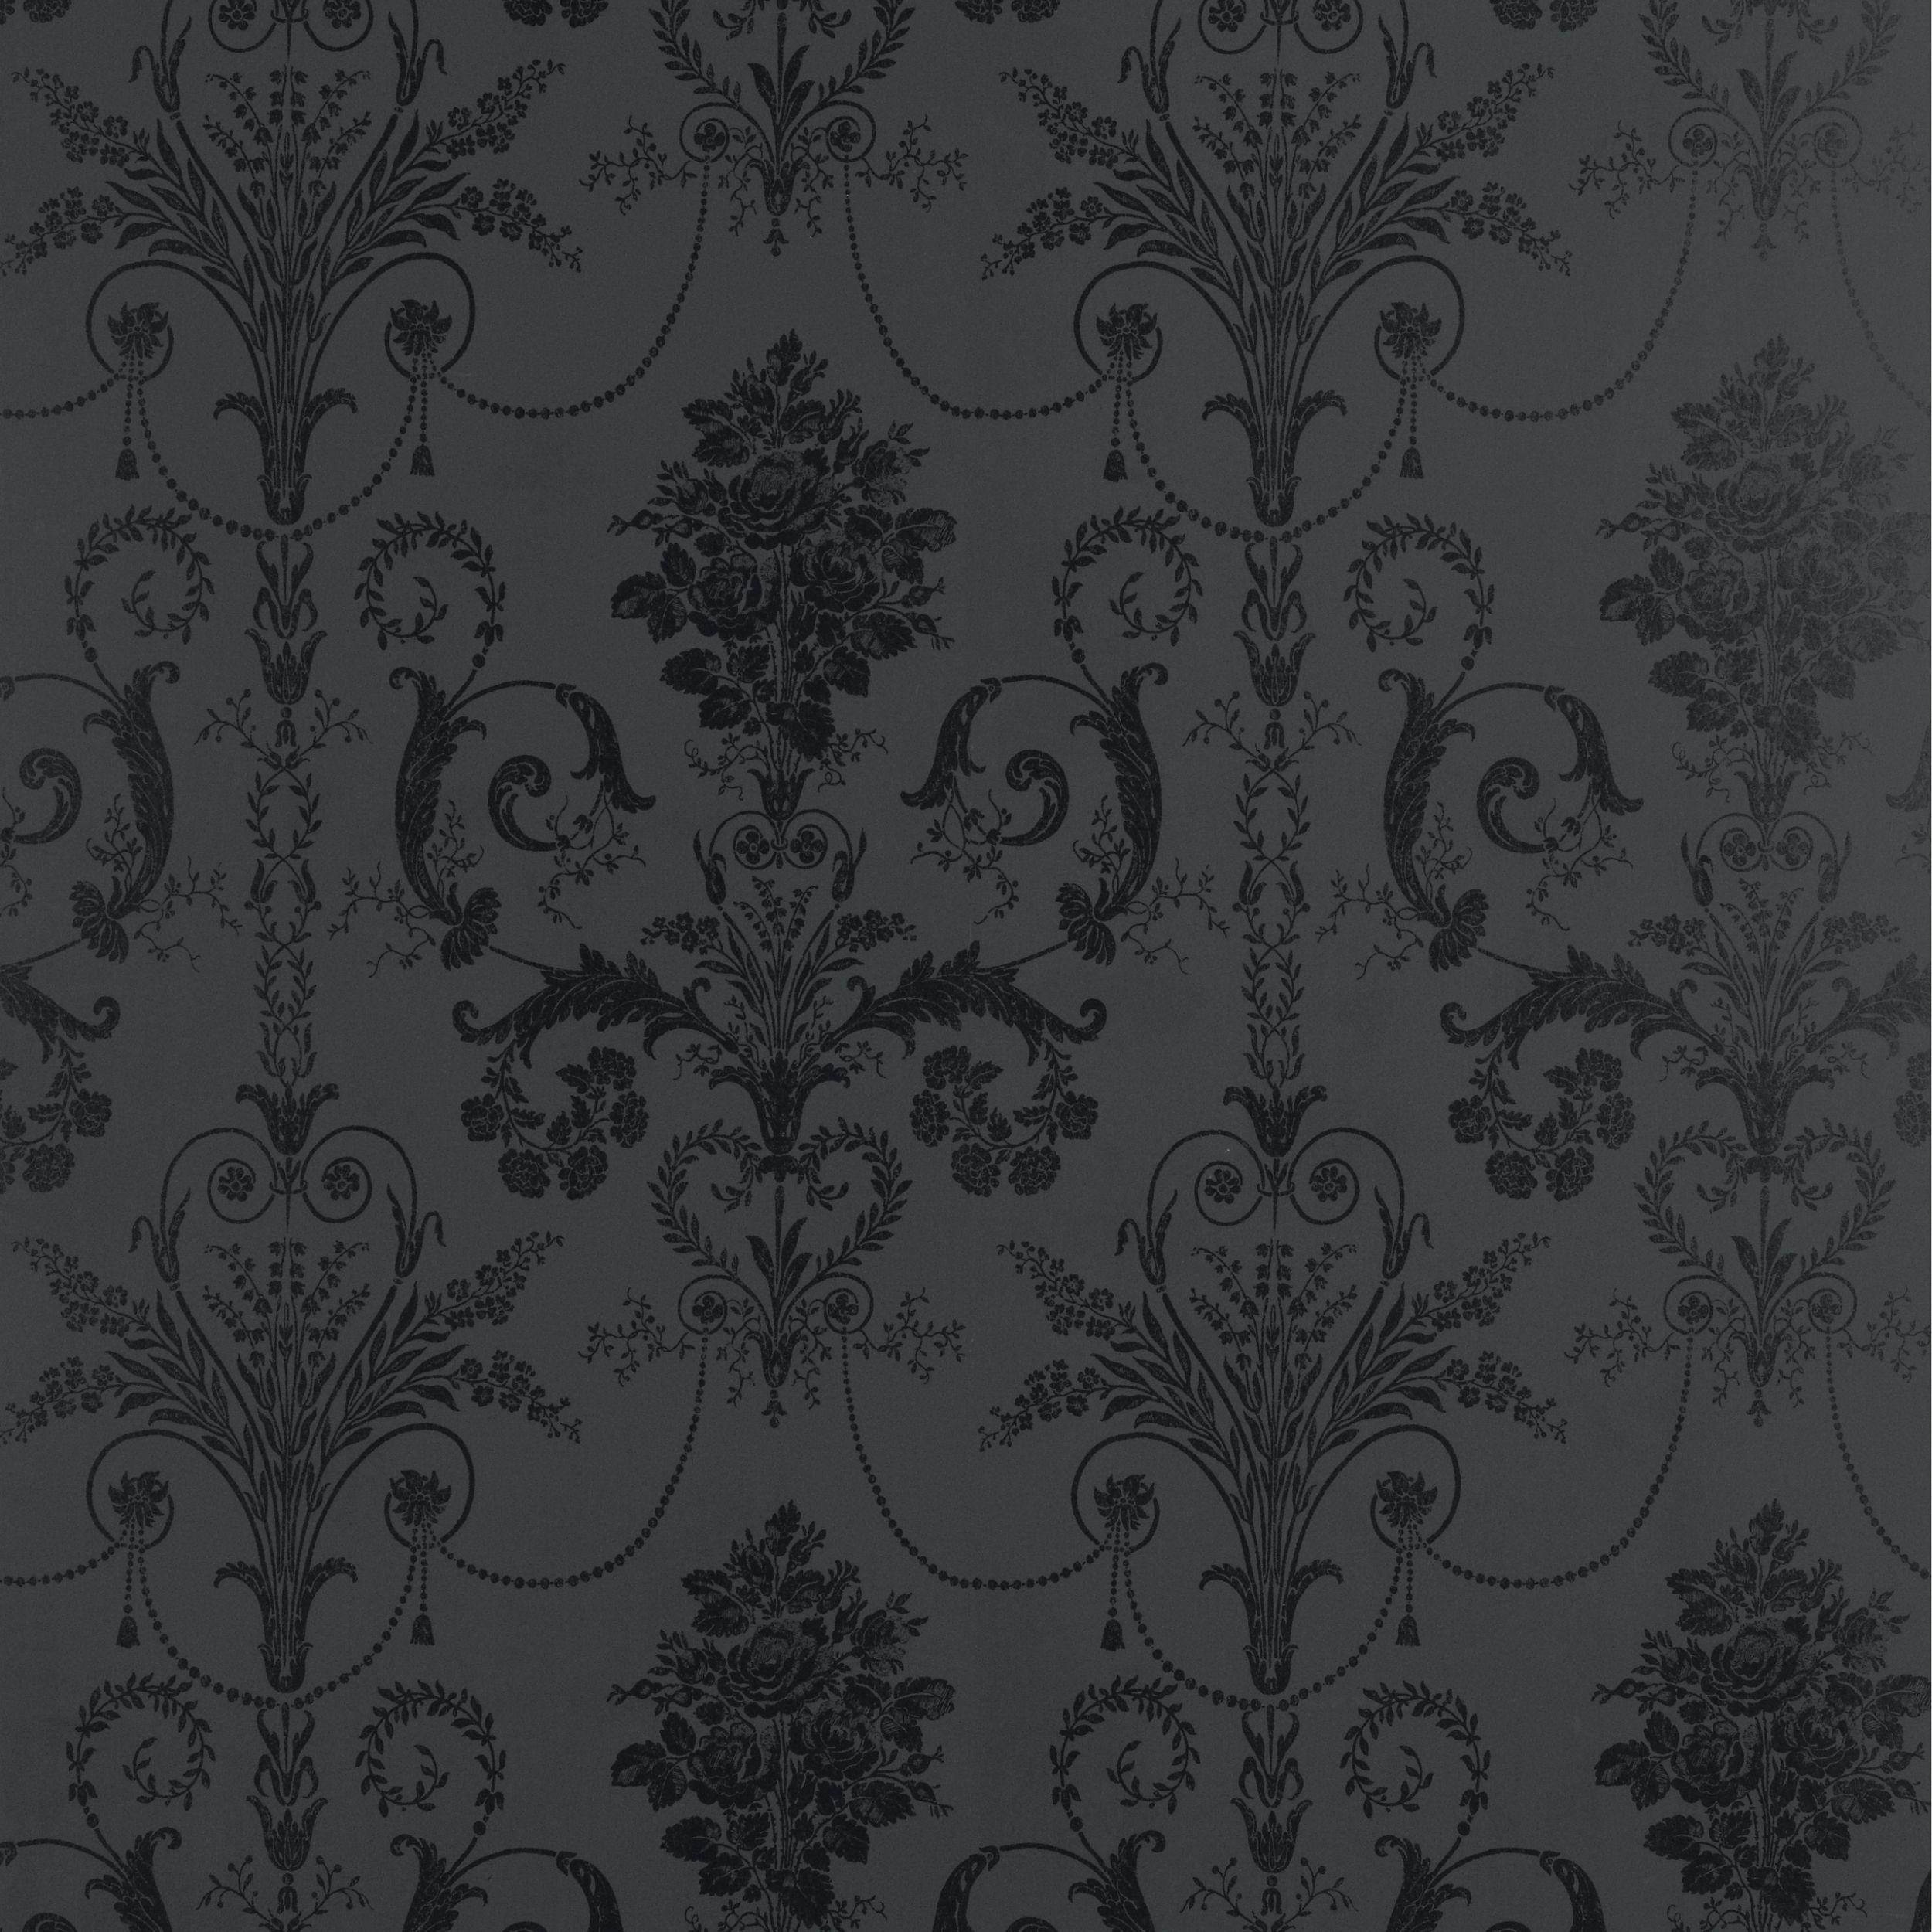 Http Lauraashley Com Josette Dark Charcoal Wallpaper HD Wallpapers Download Free Images Wallpaper [1000image.com]